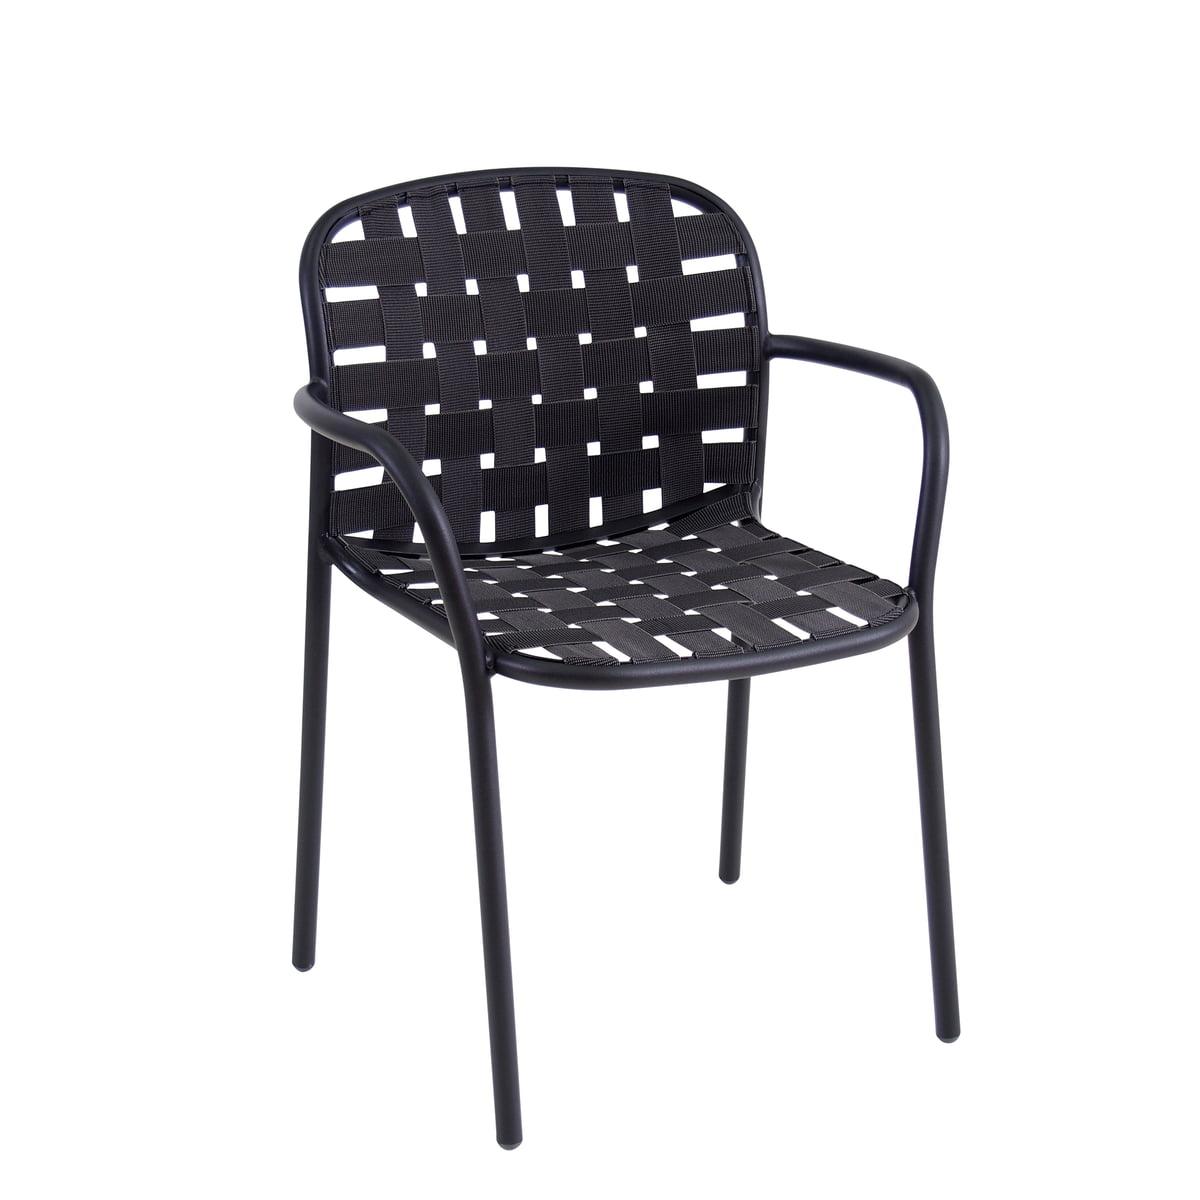 Genial Armlehnstuhl Grau Beste Wahl The Emu - Yard Armchair, Black /